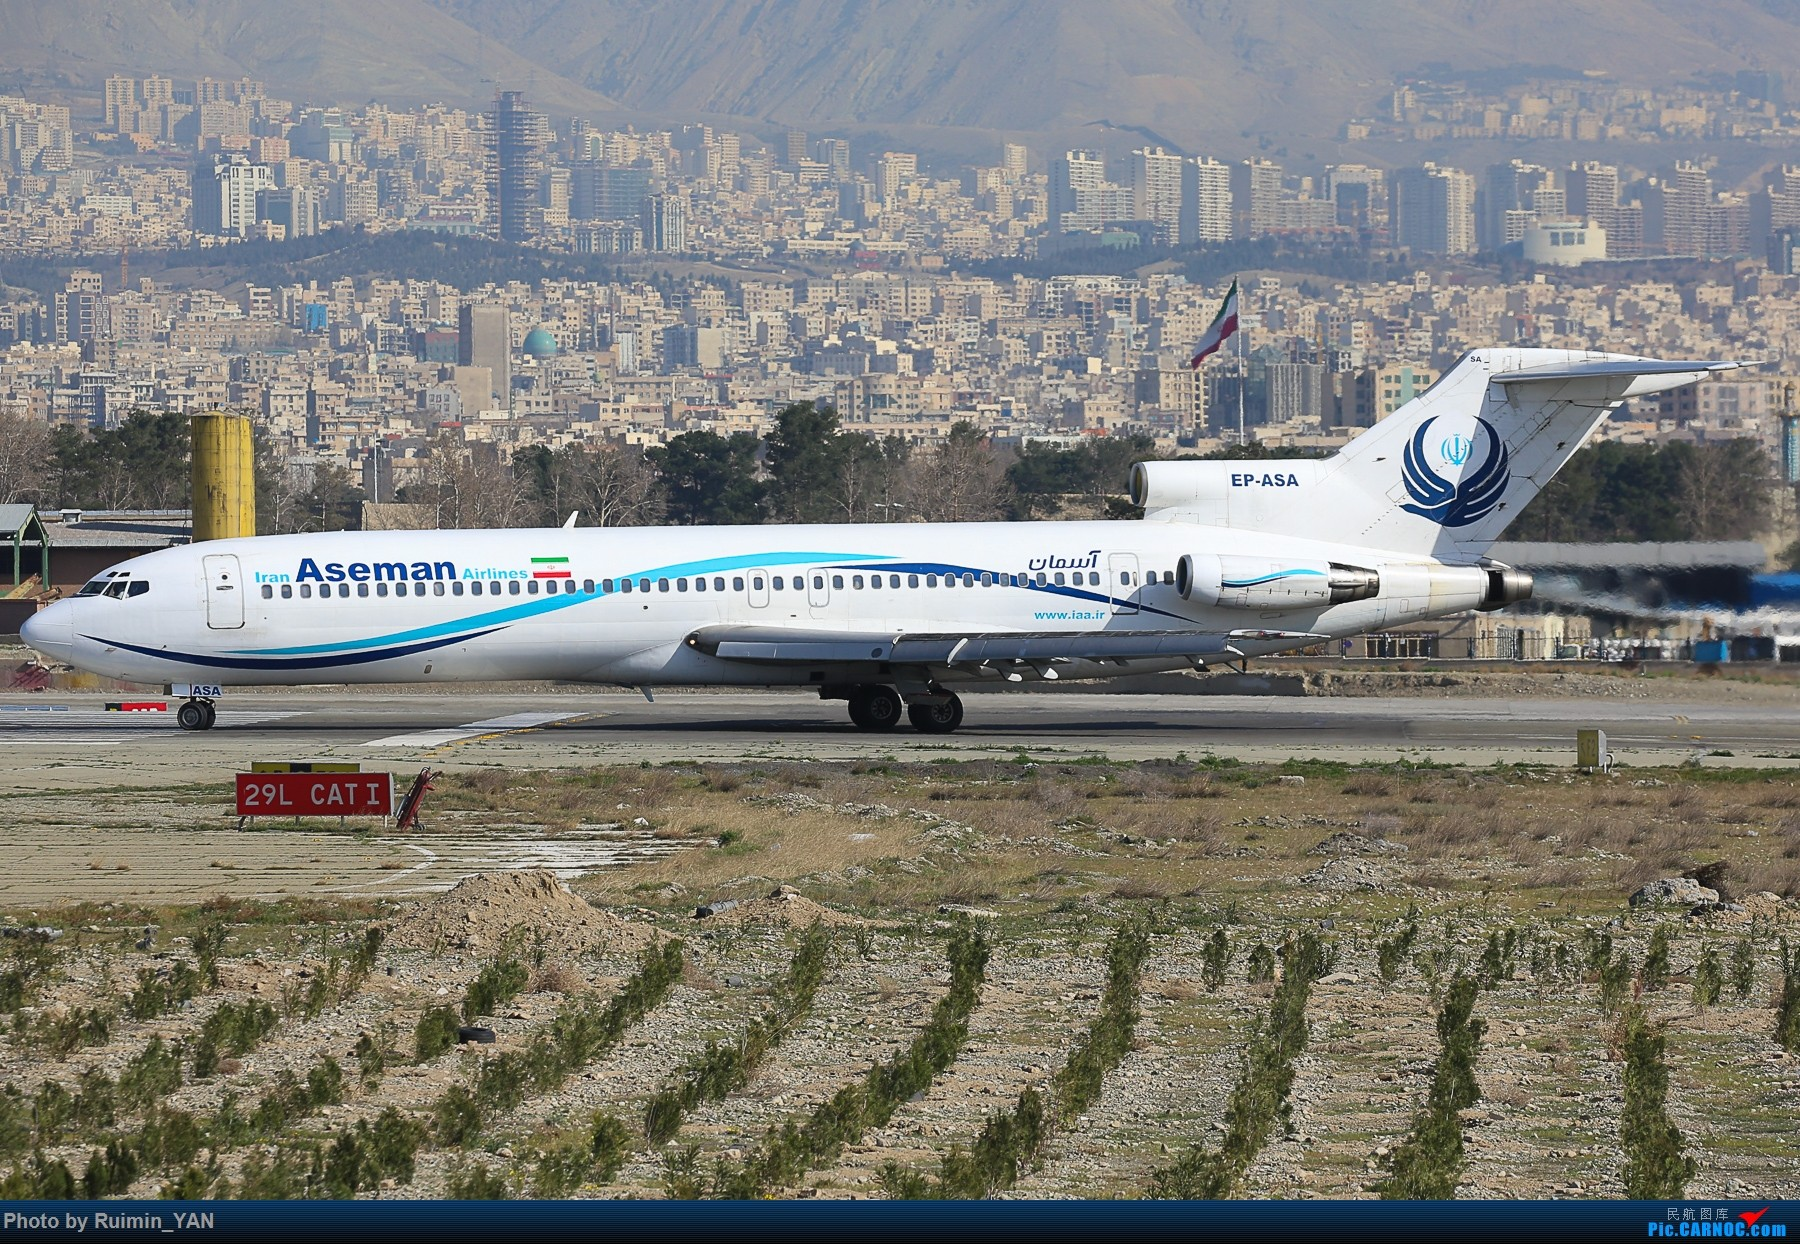 Re:[原创]【THR】【一图党】【波音727】德黑兰梅赫拉巴德机场--伊朗阿斯曼航空(Iran Aseman Airlines,EP)--波音727-200 BOEING 727-200 EP-ASA 德黑兰梅赫拉巴德国际机场